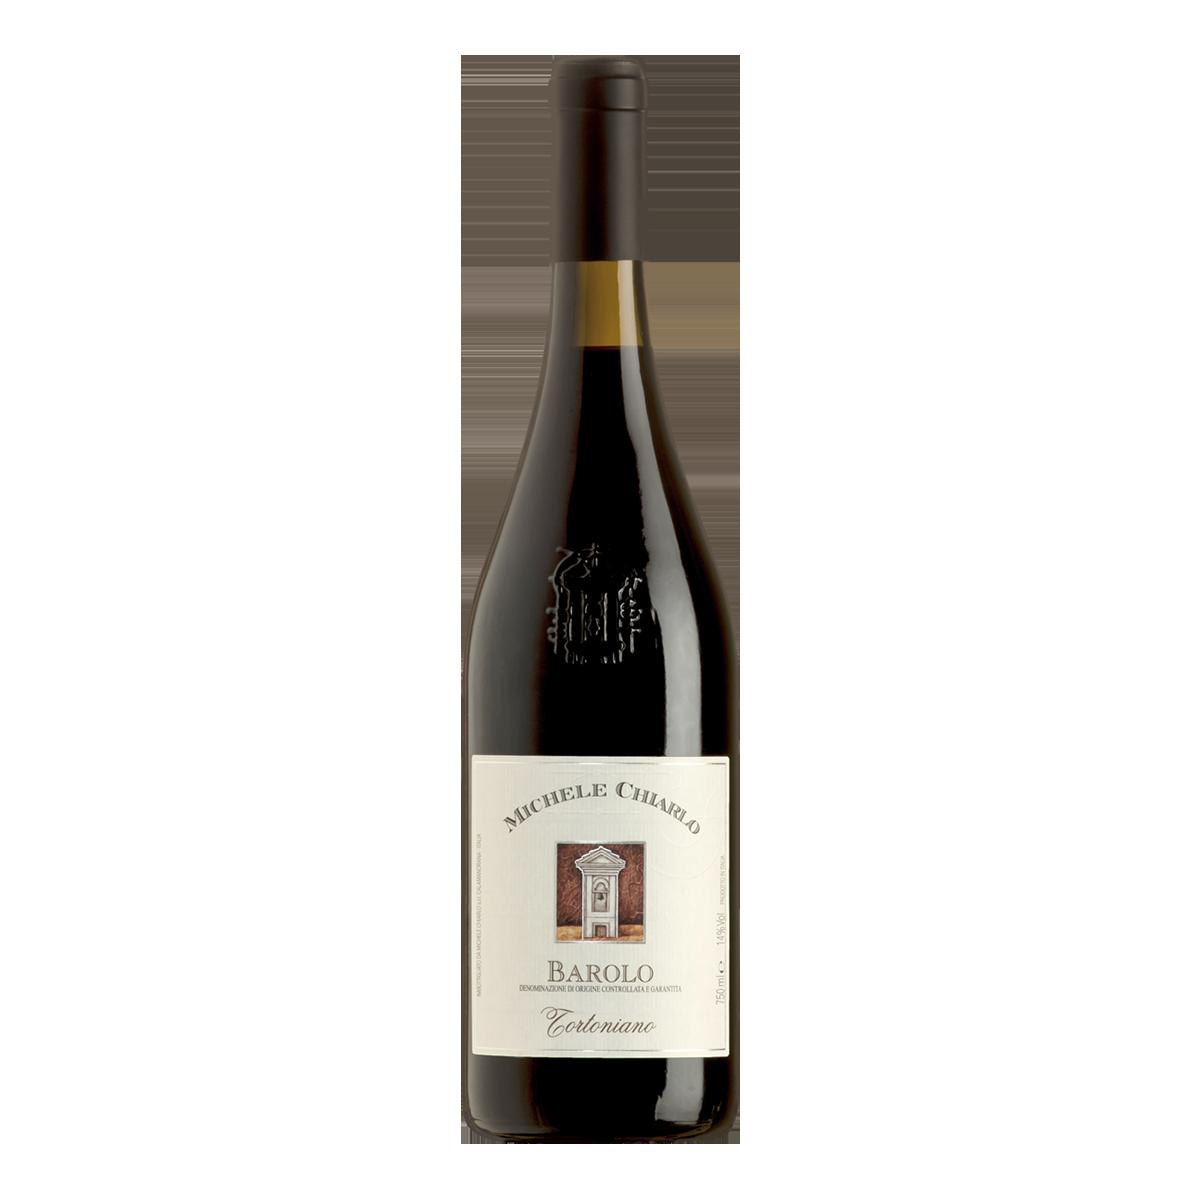 ITPC1006-15 義大利佳樂巴羅洛特級紅酒 Michele Chiarlo Barolo D.O.C.G. Tortoniano